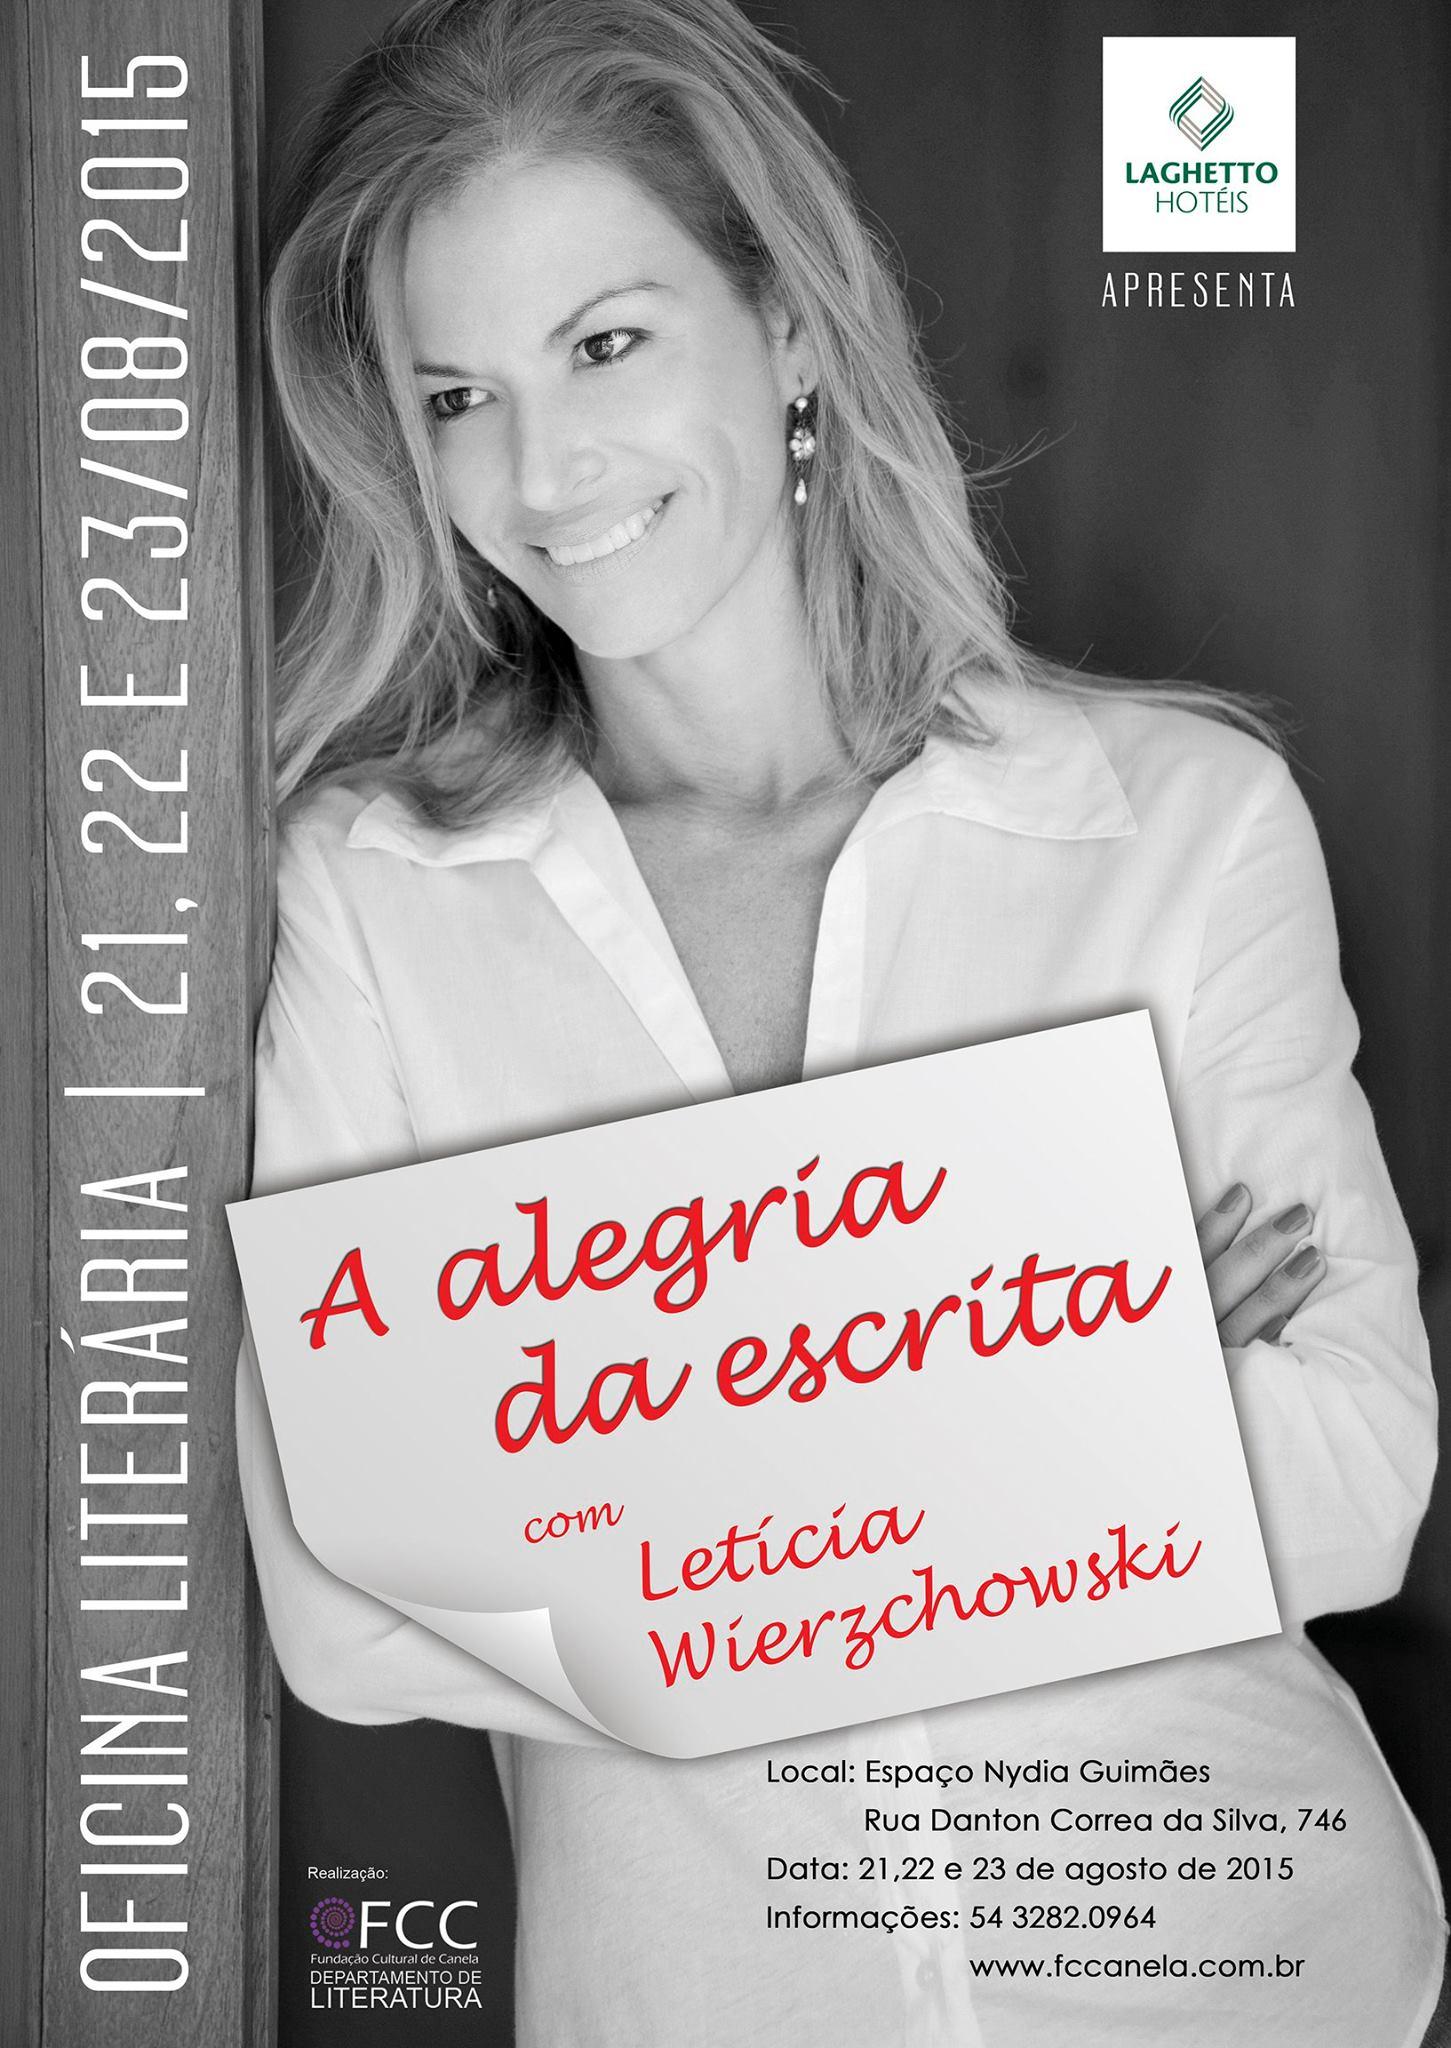 a-alegria-da-escrita-leticia-wierzchowski